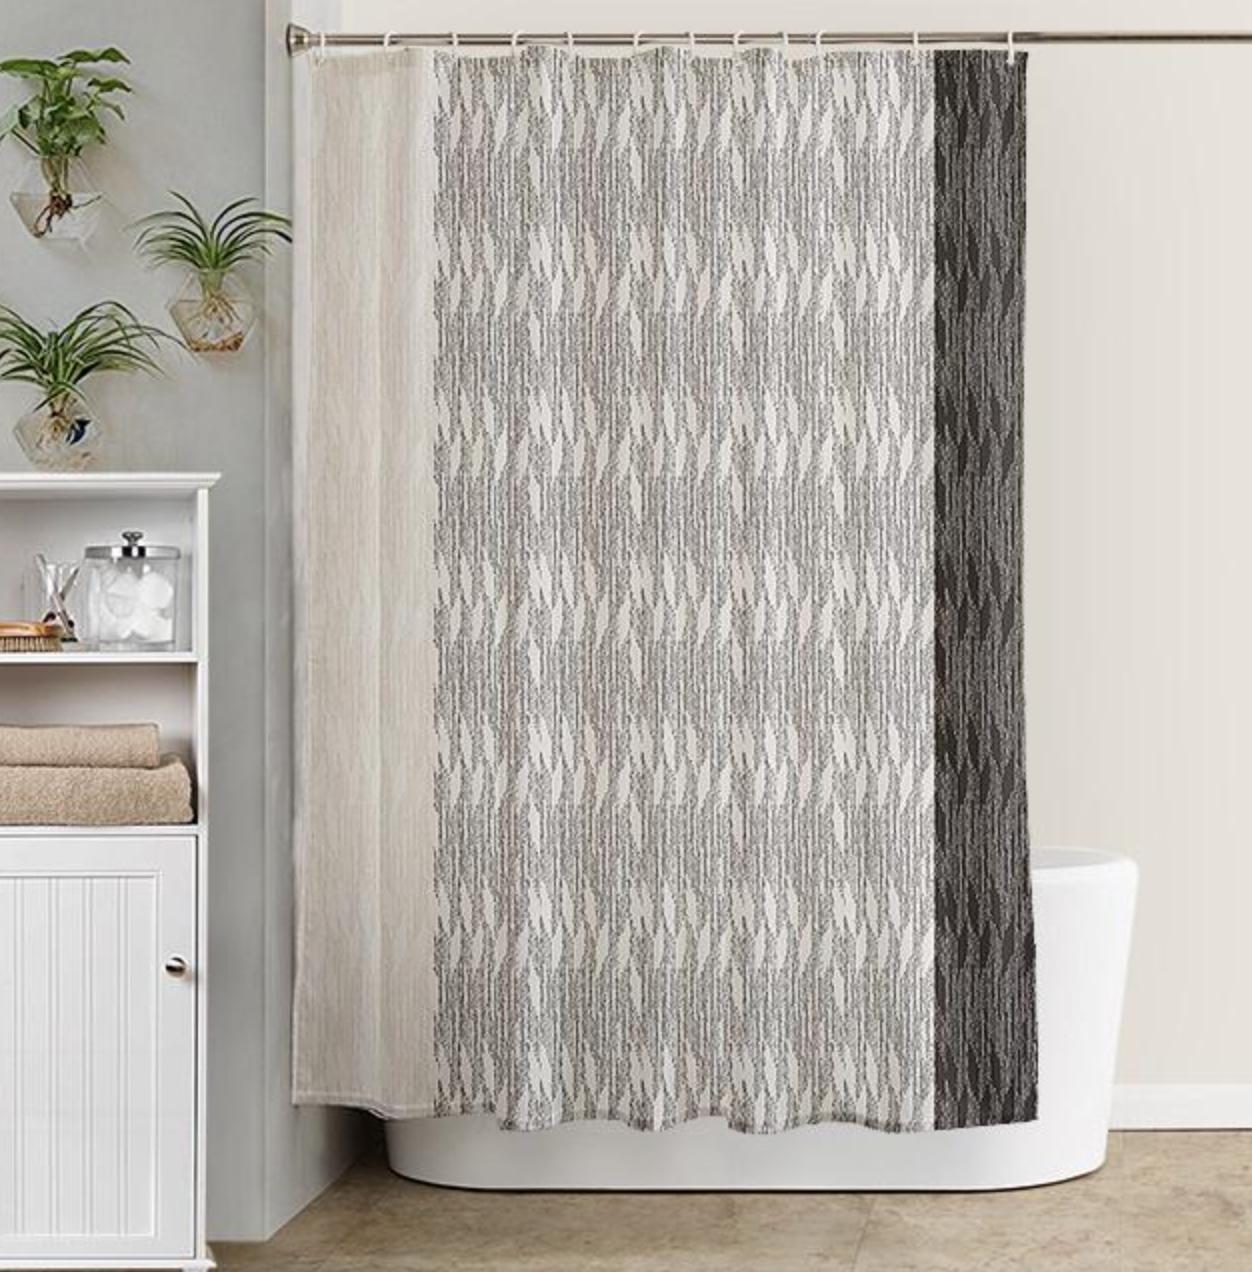 NOHO HOME Shower Curtain